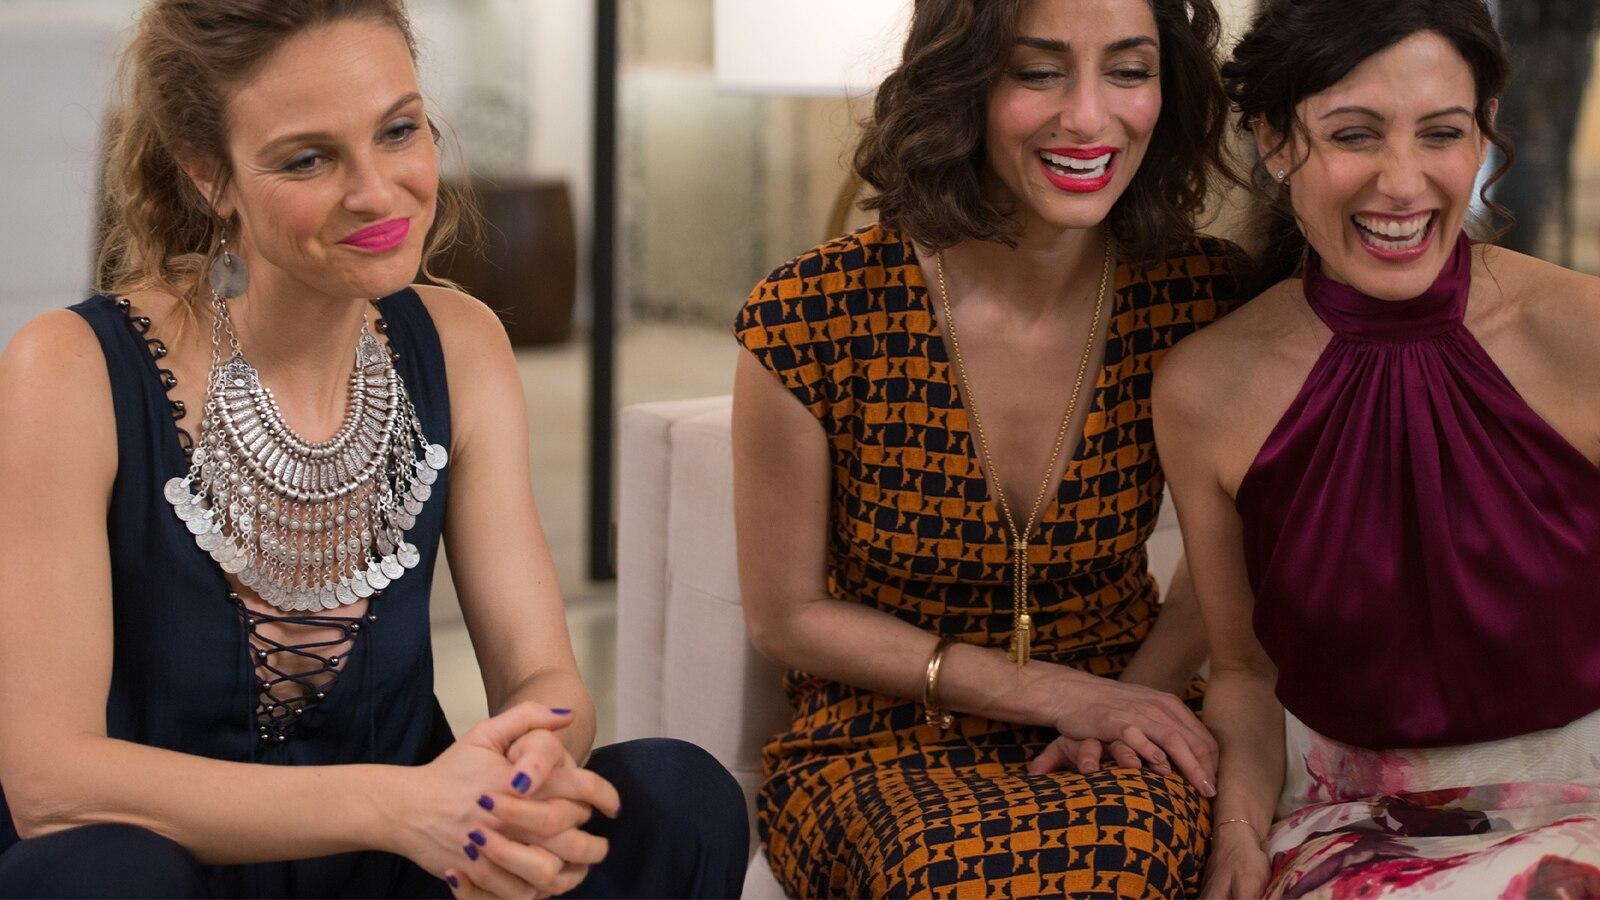 La 5 Girlfriends' guide to divorce - 1^TV